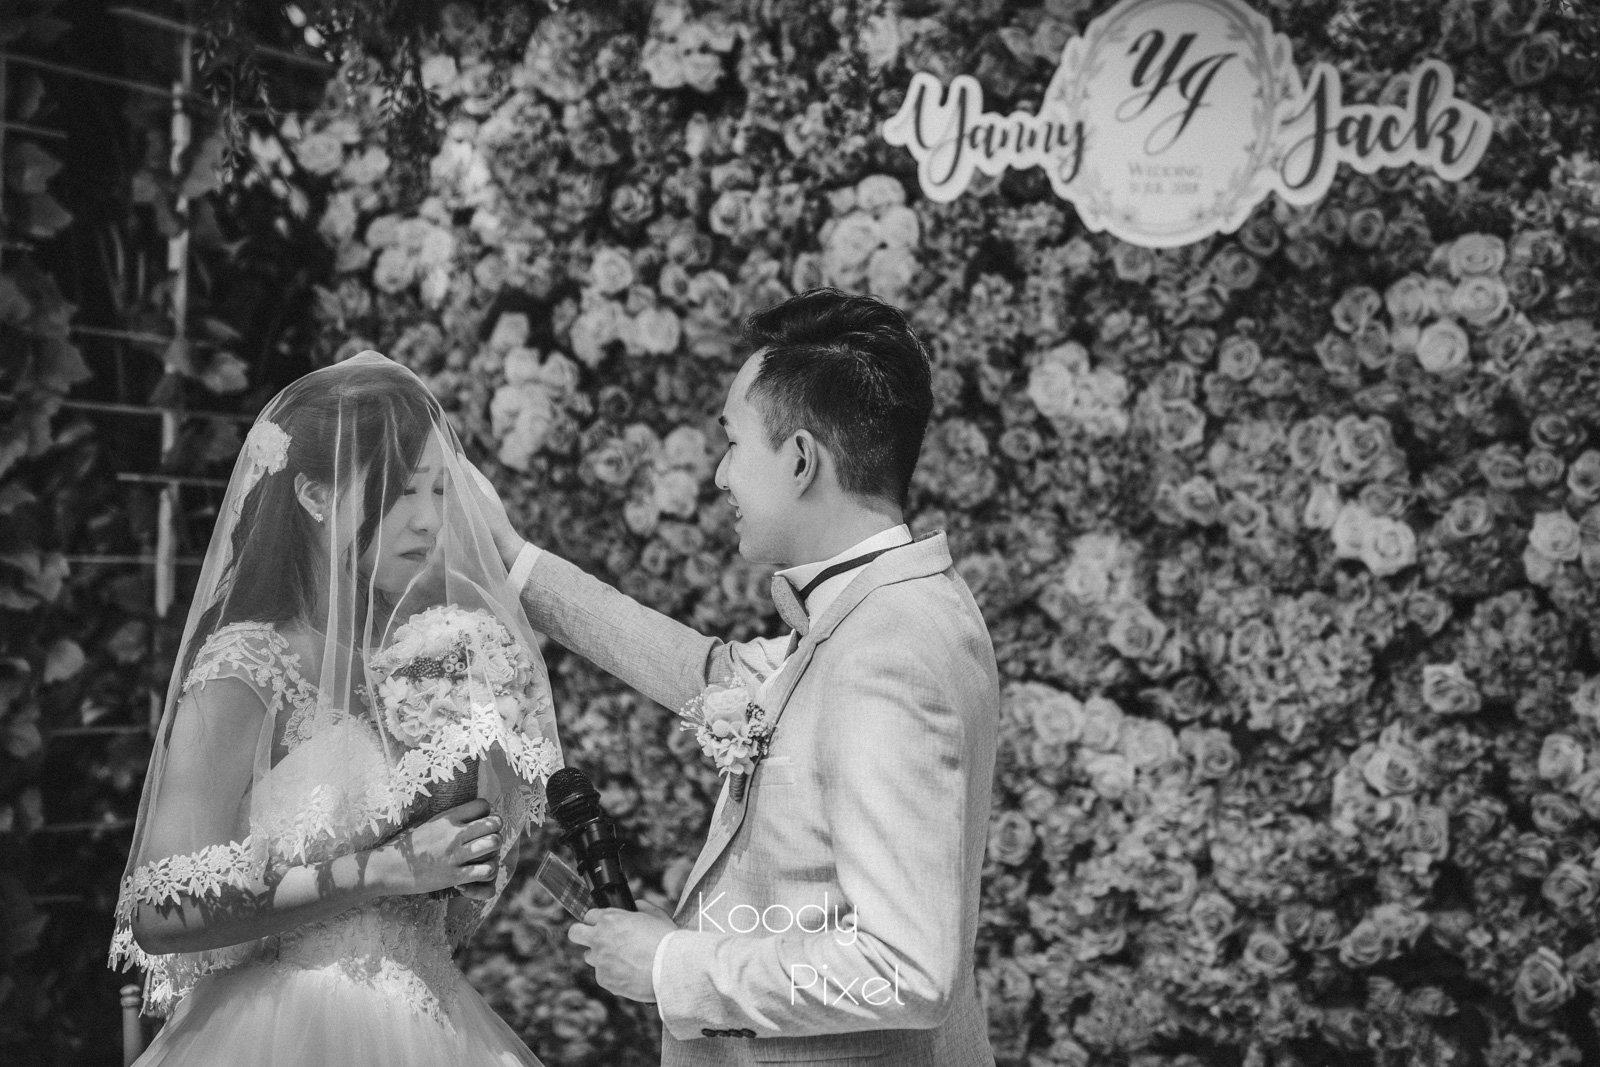 讓尋常,沁出各自的芬芳 | Big Day Photography | 婚禮攝影